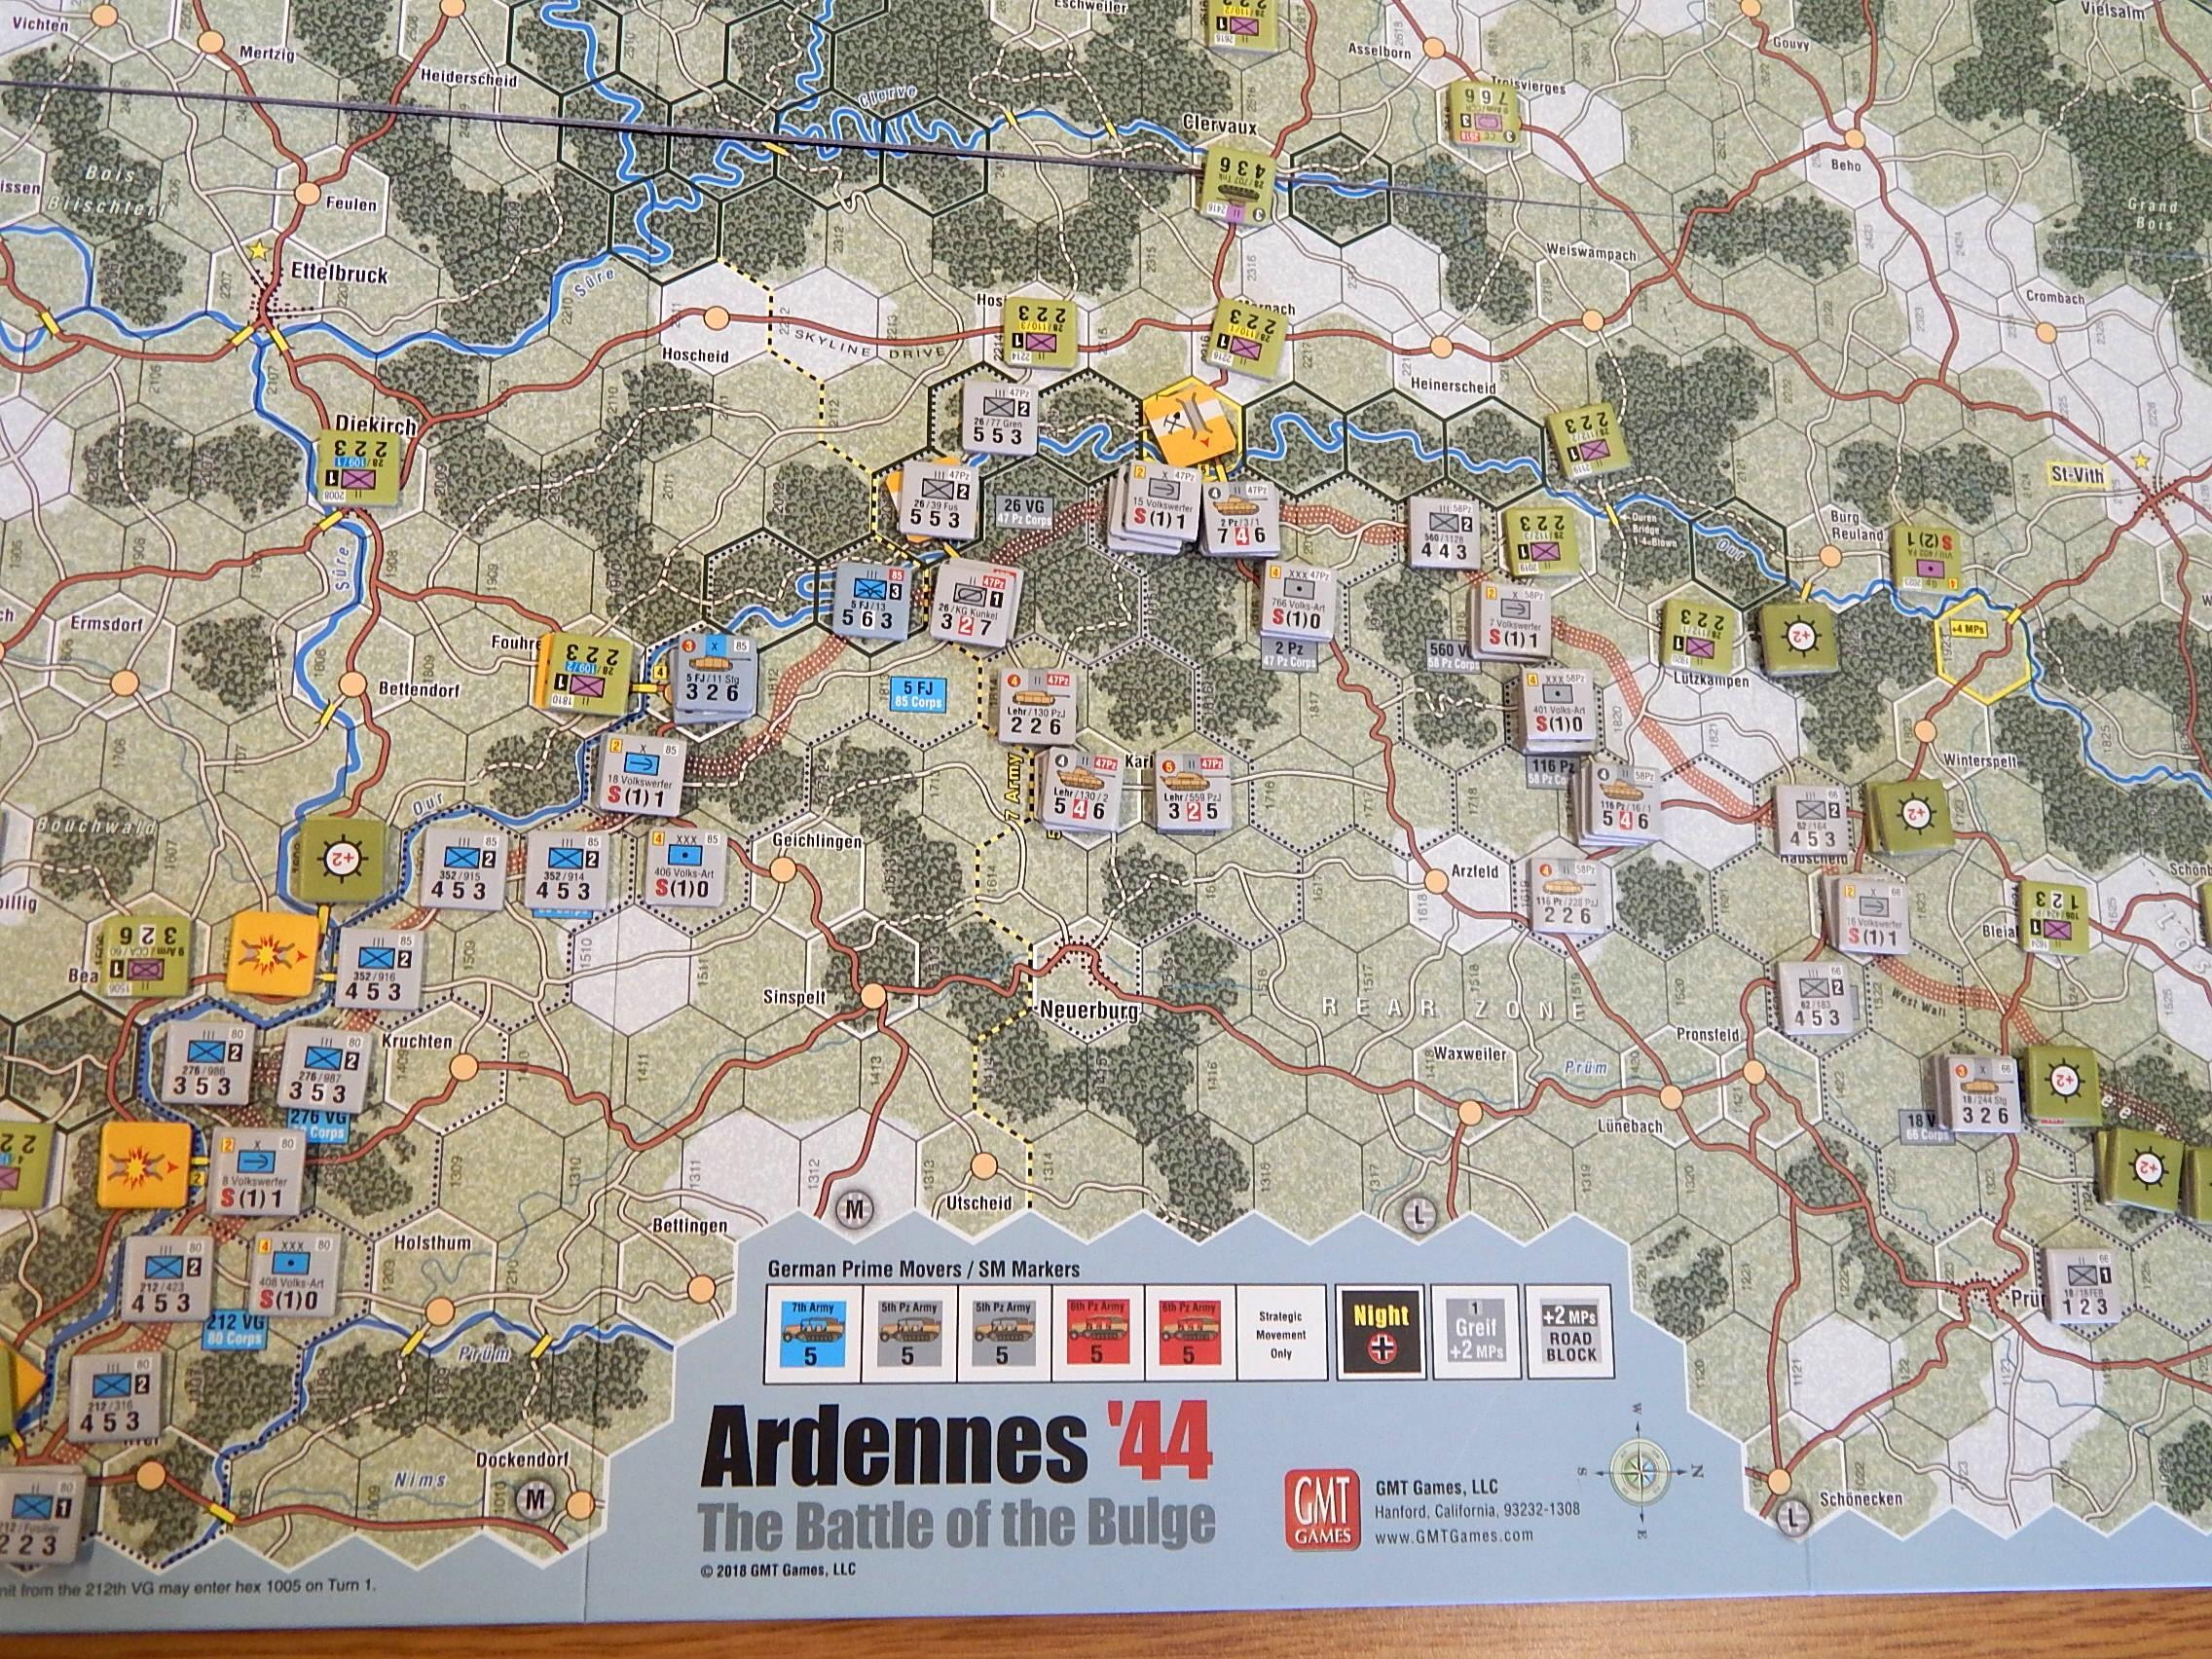 https://i.ibb.co/vcjHvxZ/Ardennes-44-Setup-A.jpg